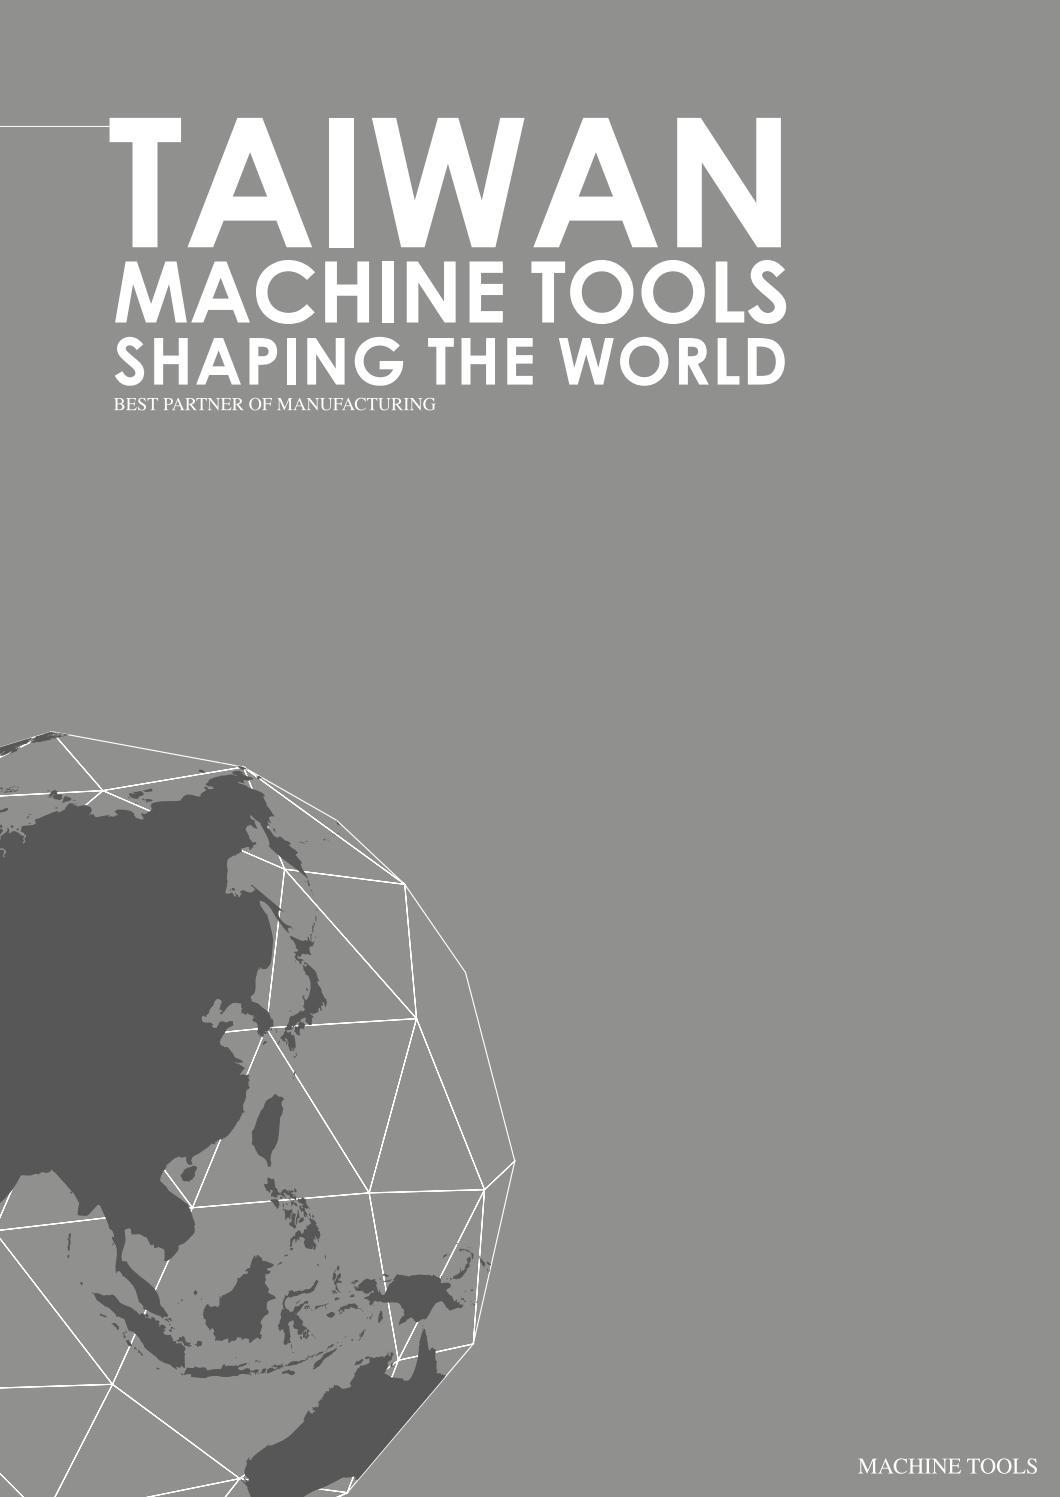 TWMT-Machine tools by Taiwan Machine Tools - issuu